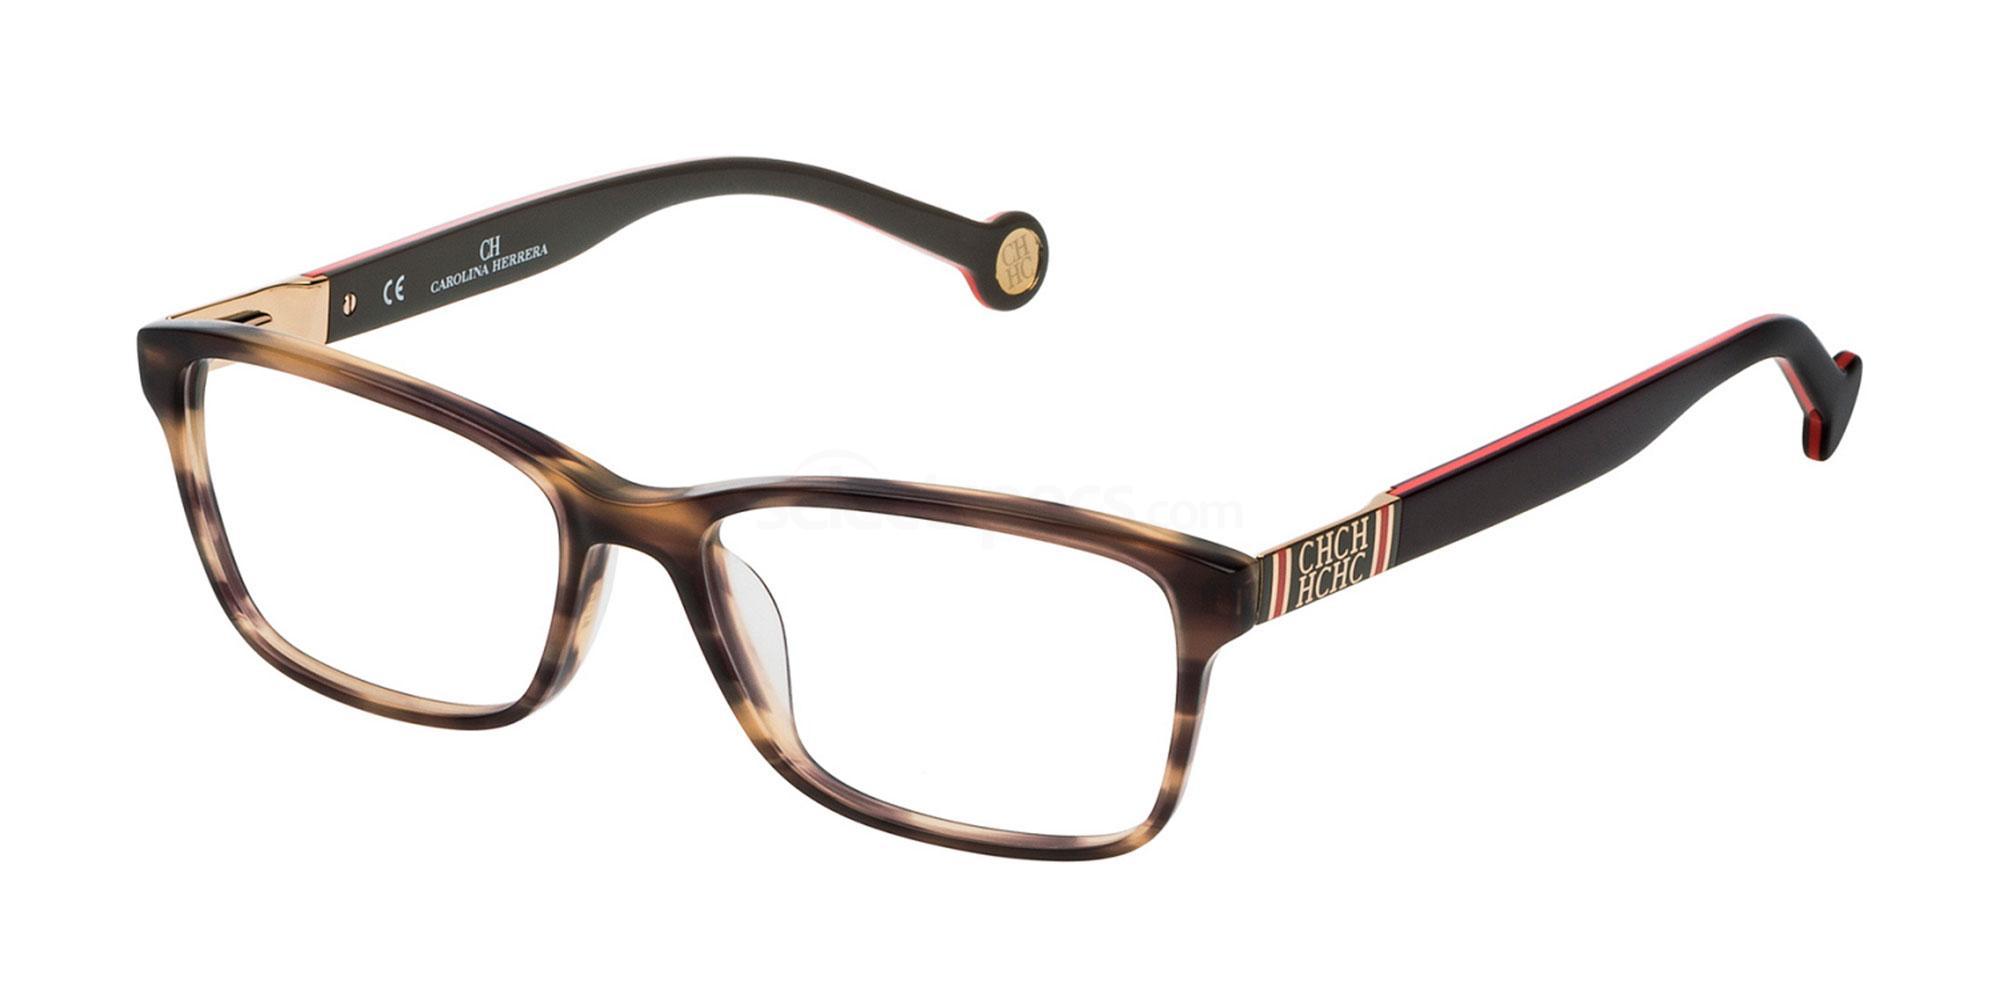 06HN VHE711 Glasses, CH Carolina Herrera